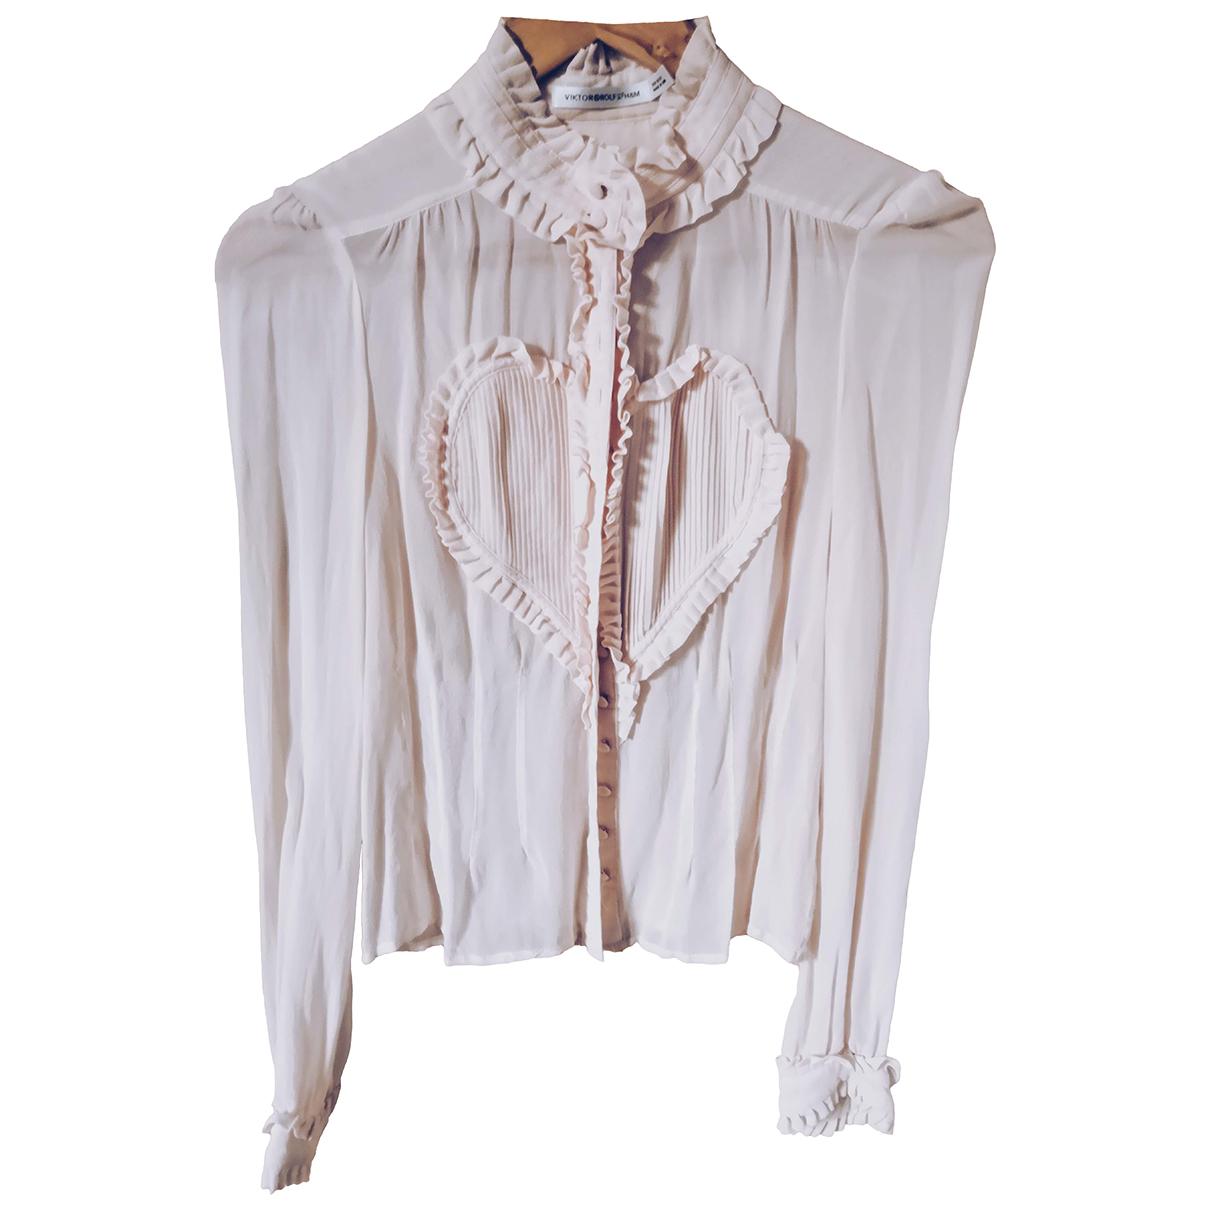 Camisa de Seda Viktor & Rolf By H&m